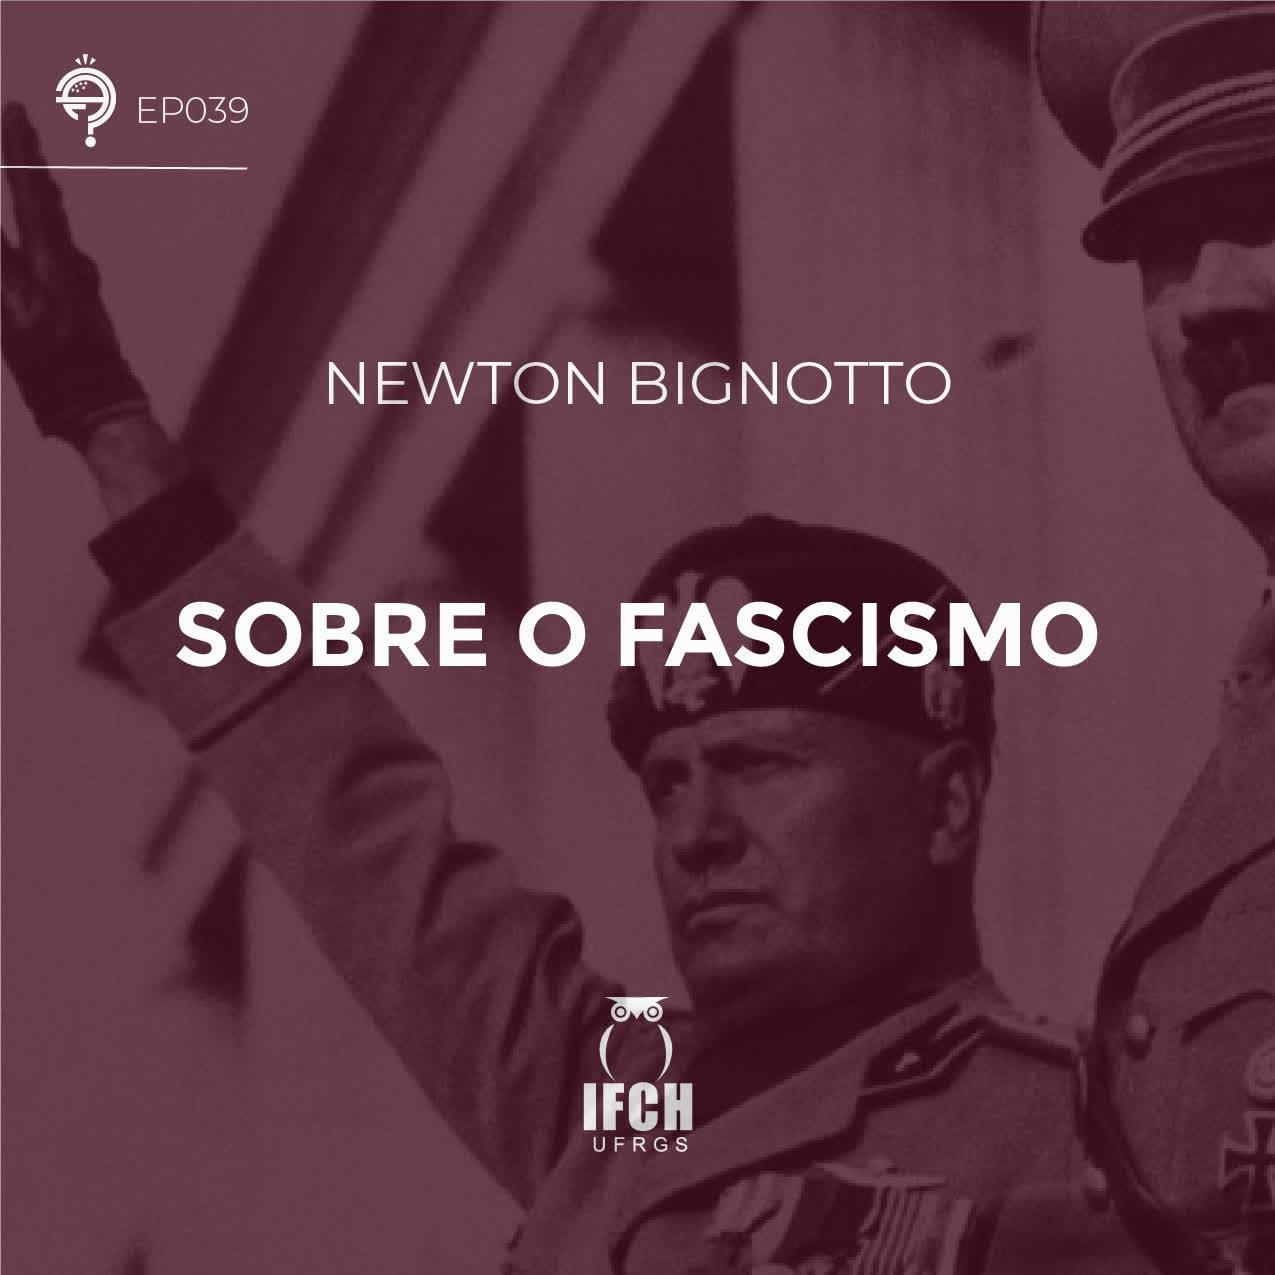 Ep. 039: Sobre o Fascismo